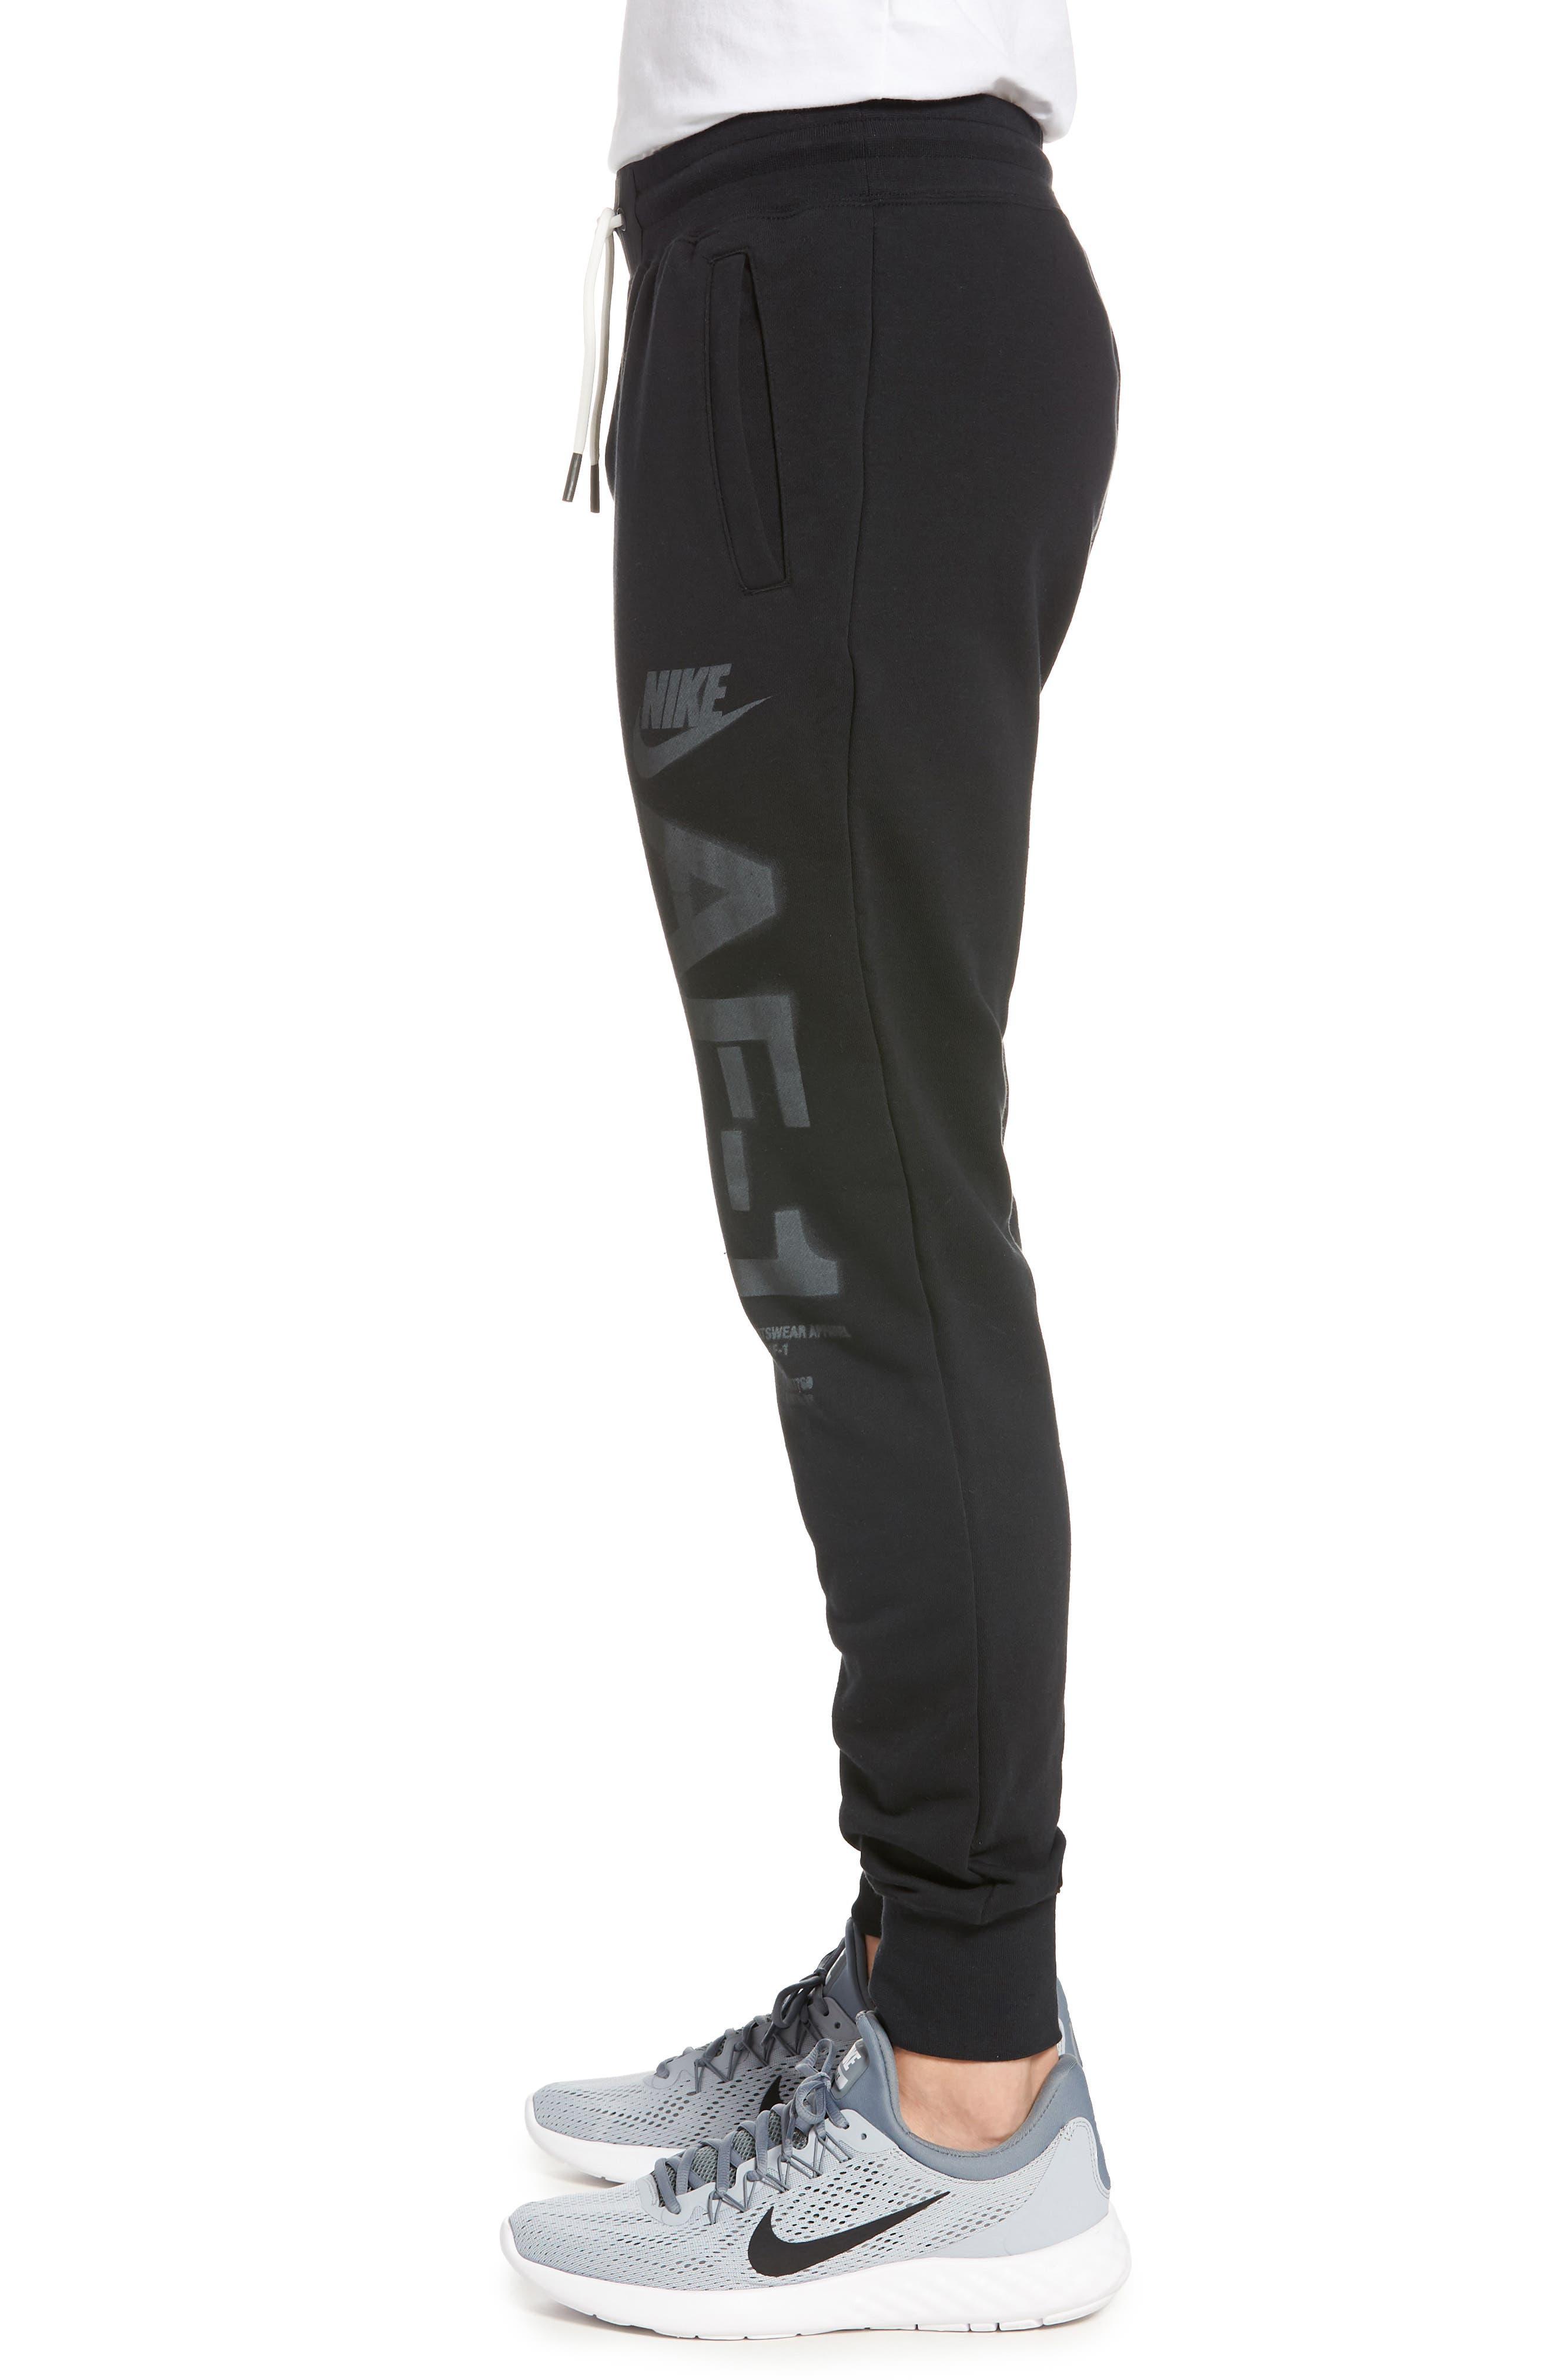 Sportswear Air Force 1 Jogger Pants,                             Alternate thumbnail 3, color,                             BLACK/ ANTHRACITE